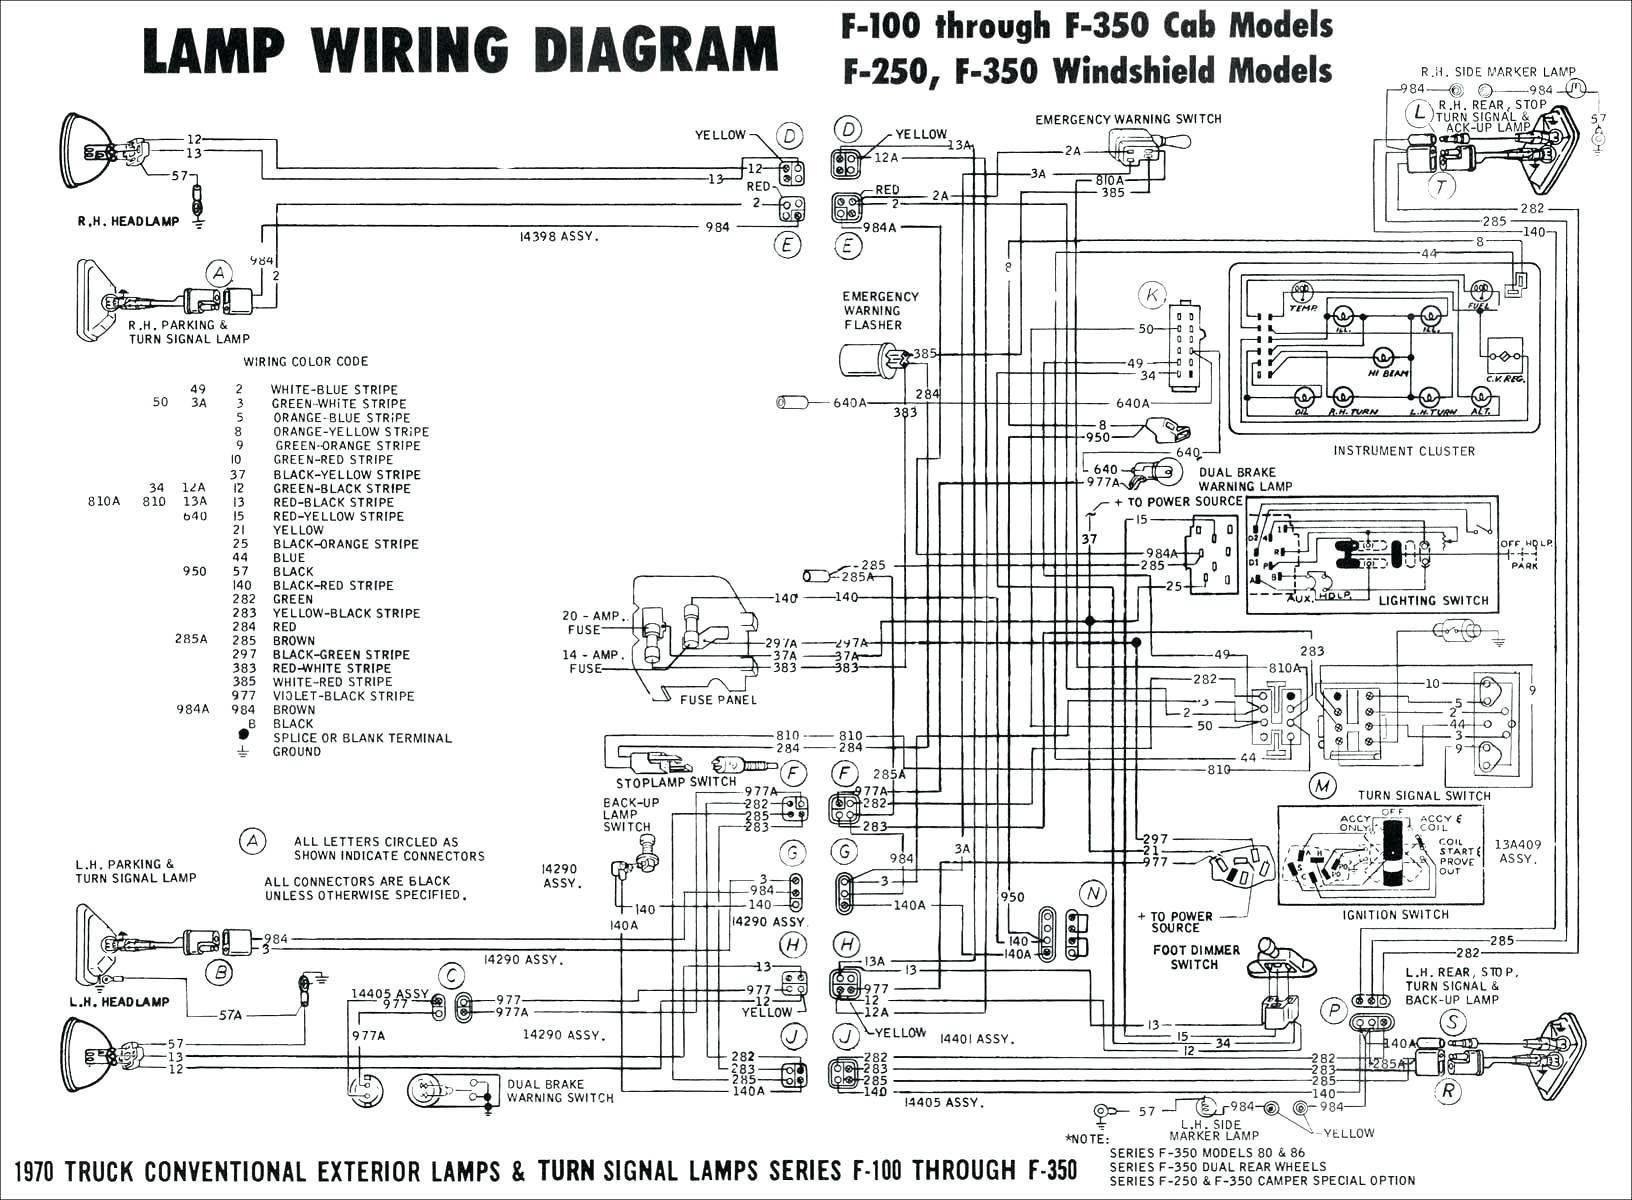 pontiac montana wiring wiring diagram 2000 Honda Odyssey Wiring-Diagram 2000 pontiac montana wiring diagram fuse 29 data wiring diagram blog2000 pontiac montana wiring diagram fuse